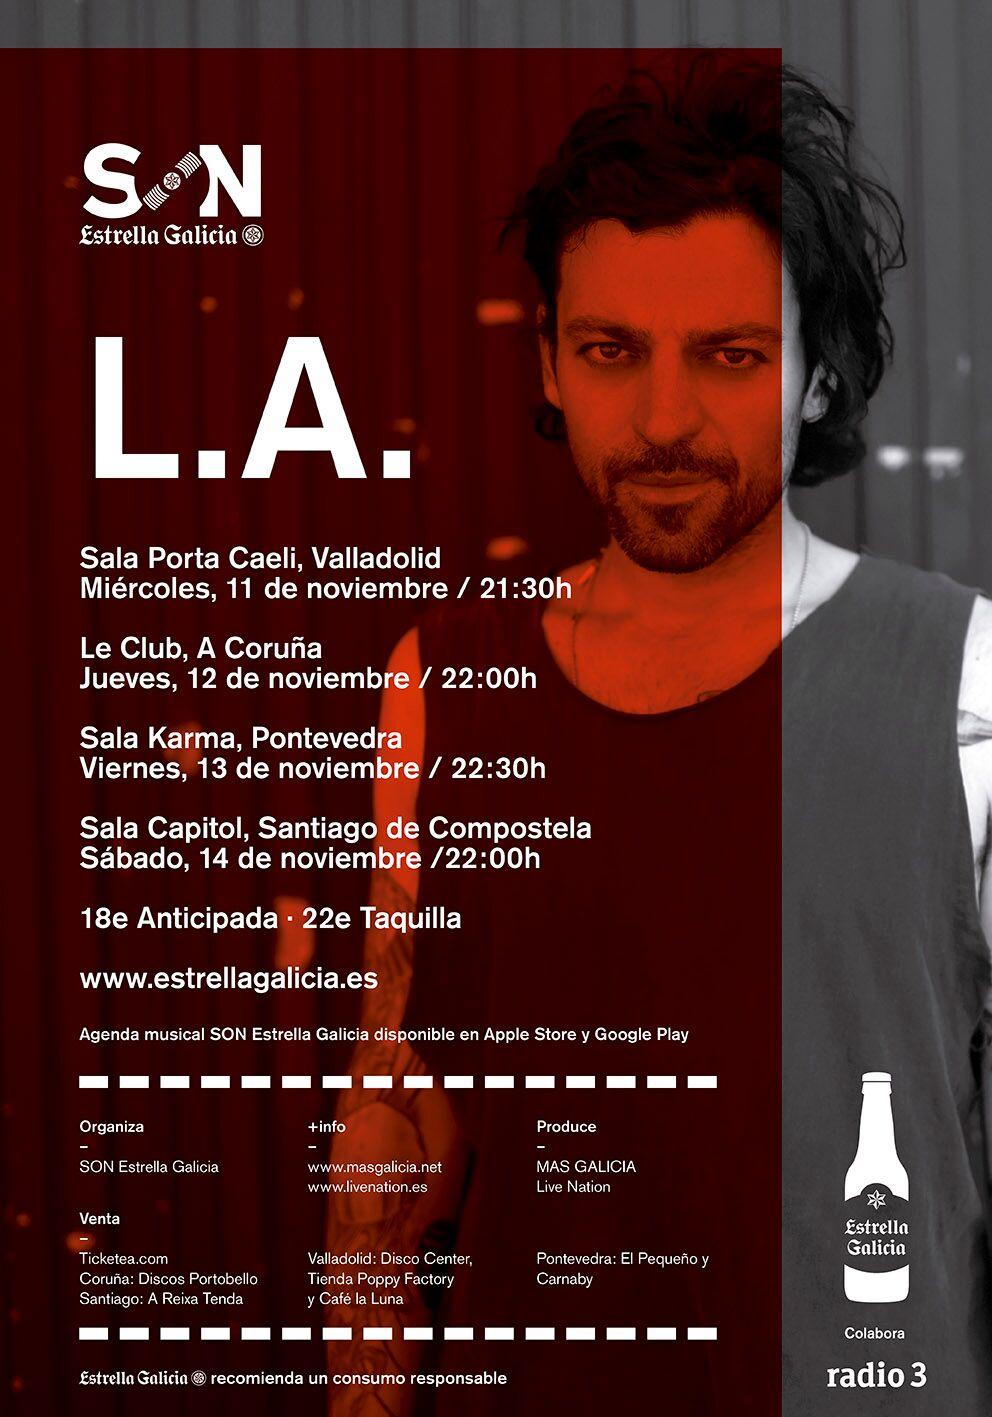 poster Galicia shows